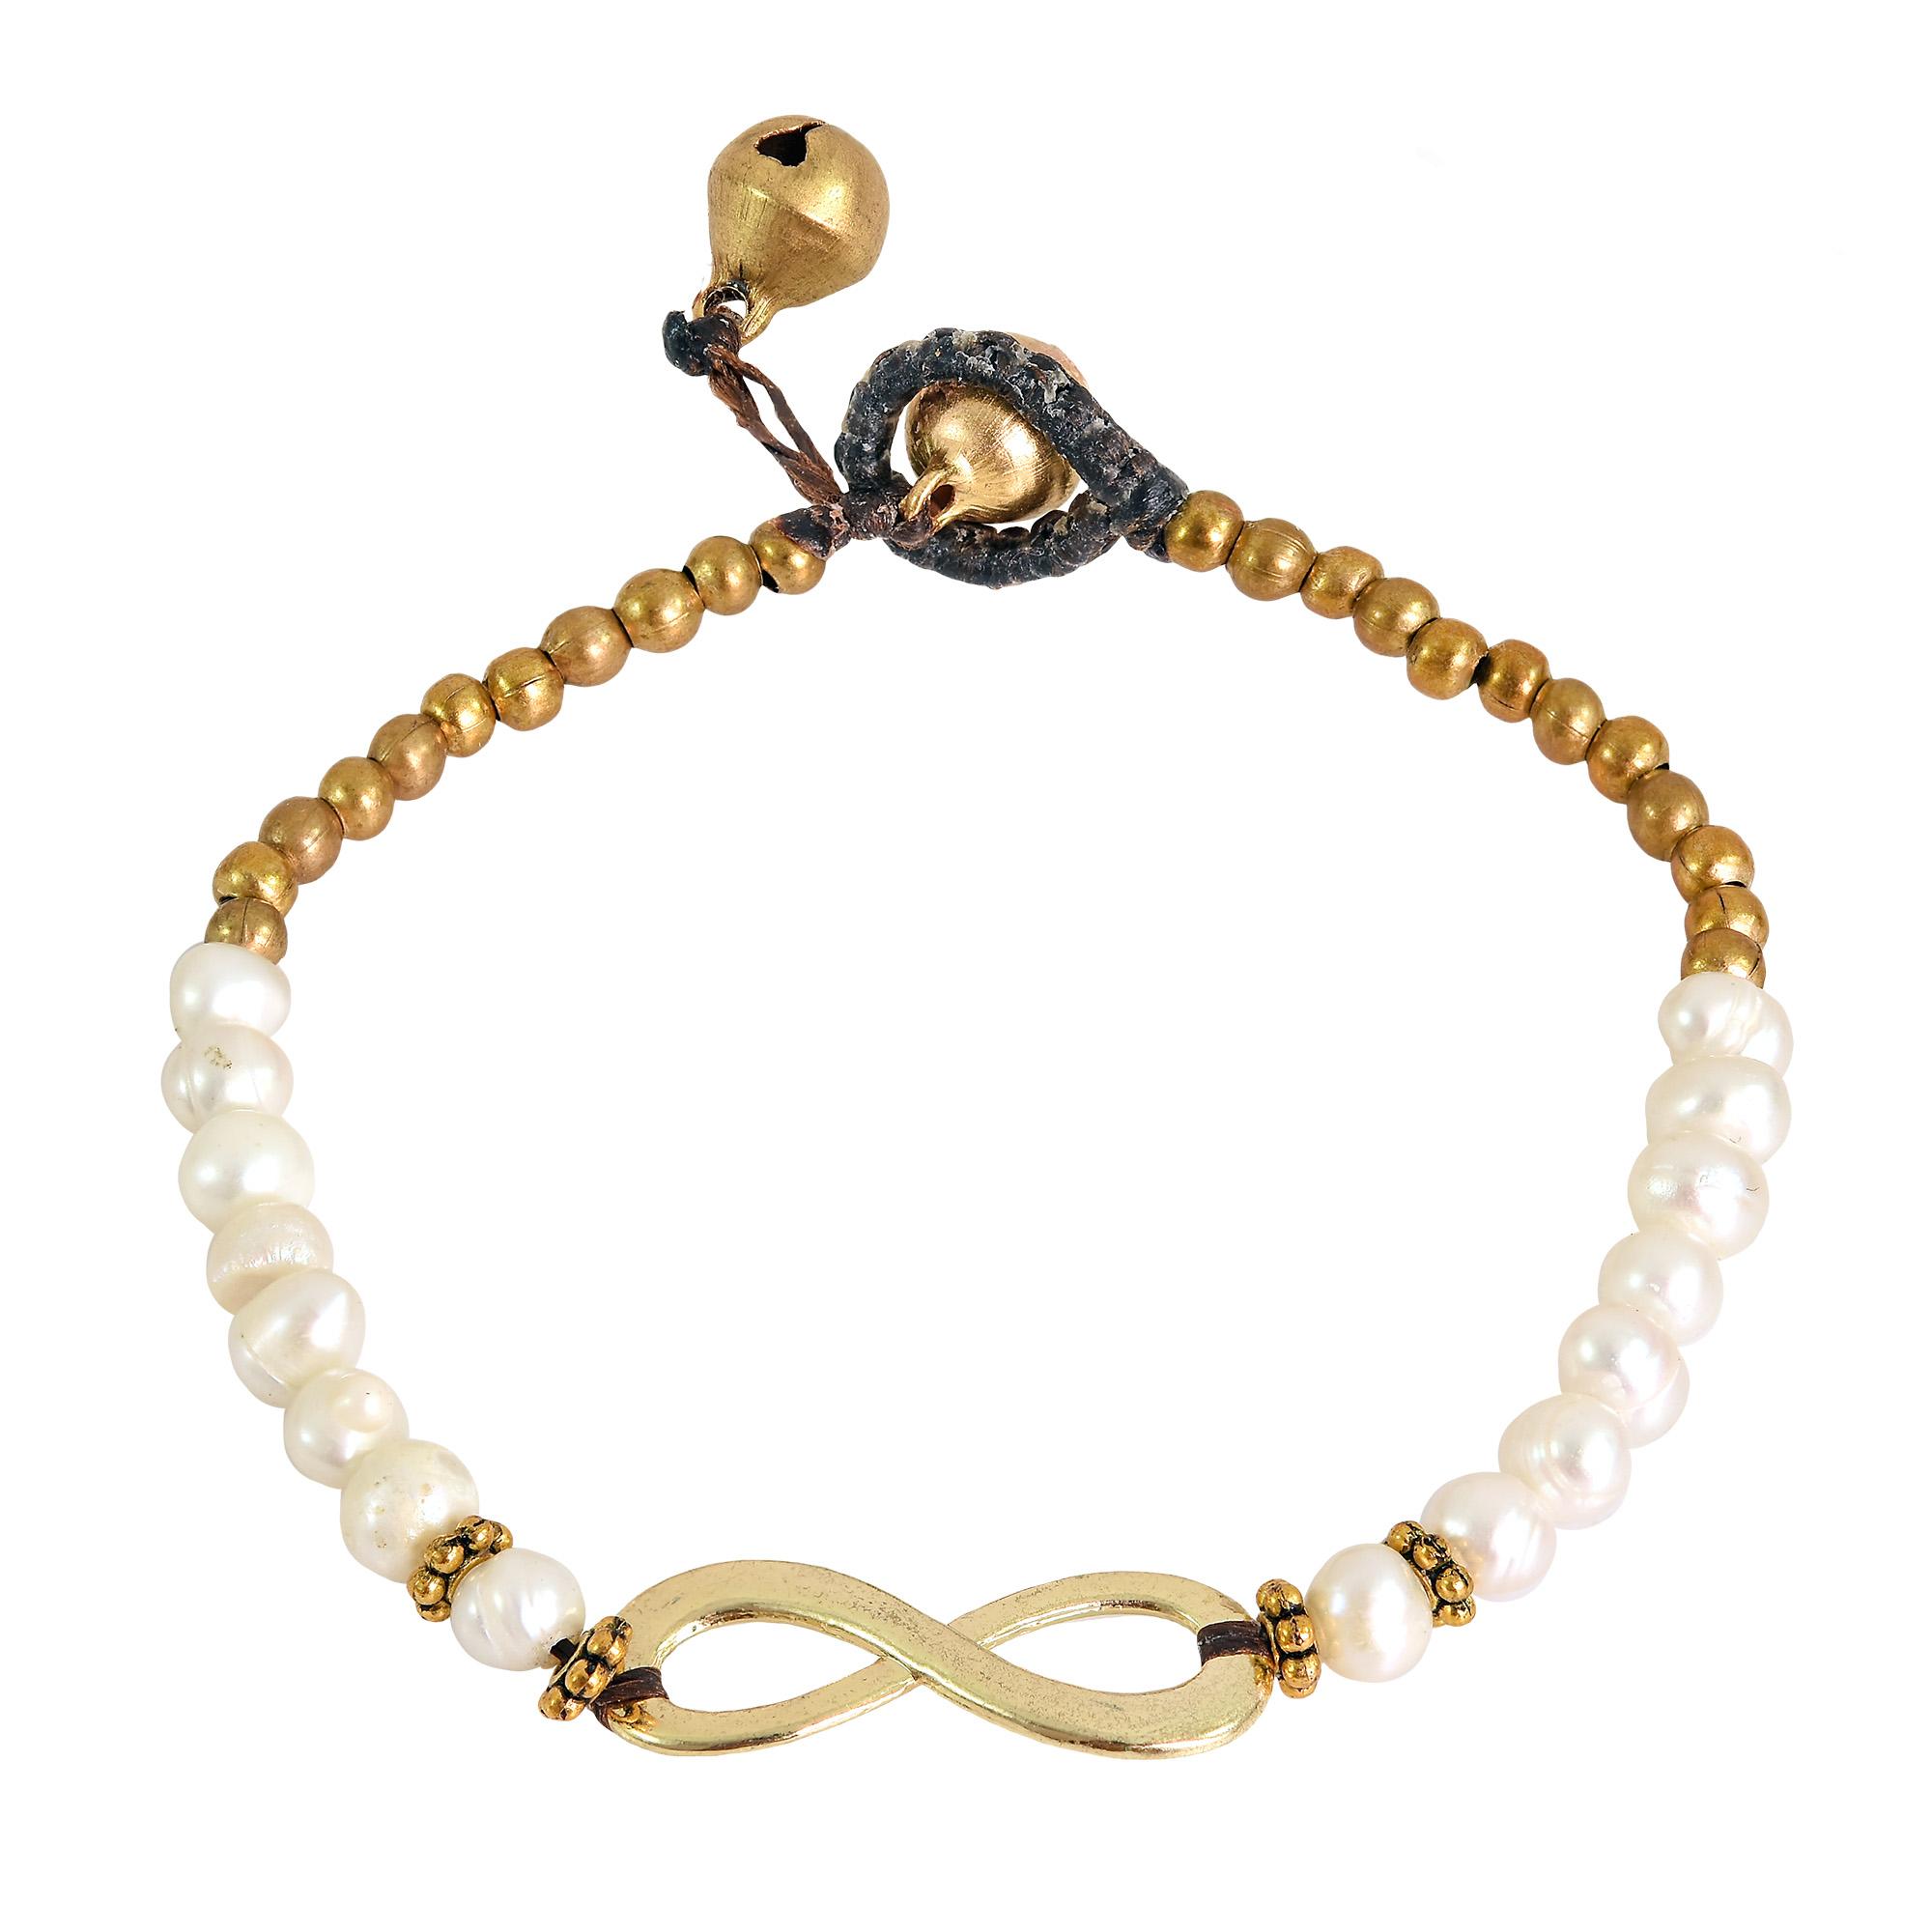 Beautiful Infinity Symbol With White Pearls Brass Beads Handmade